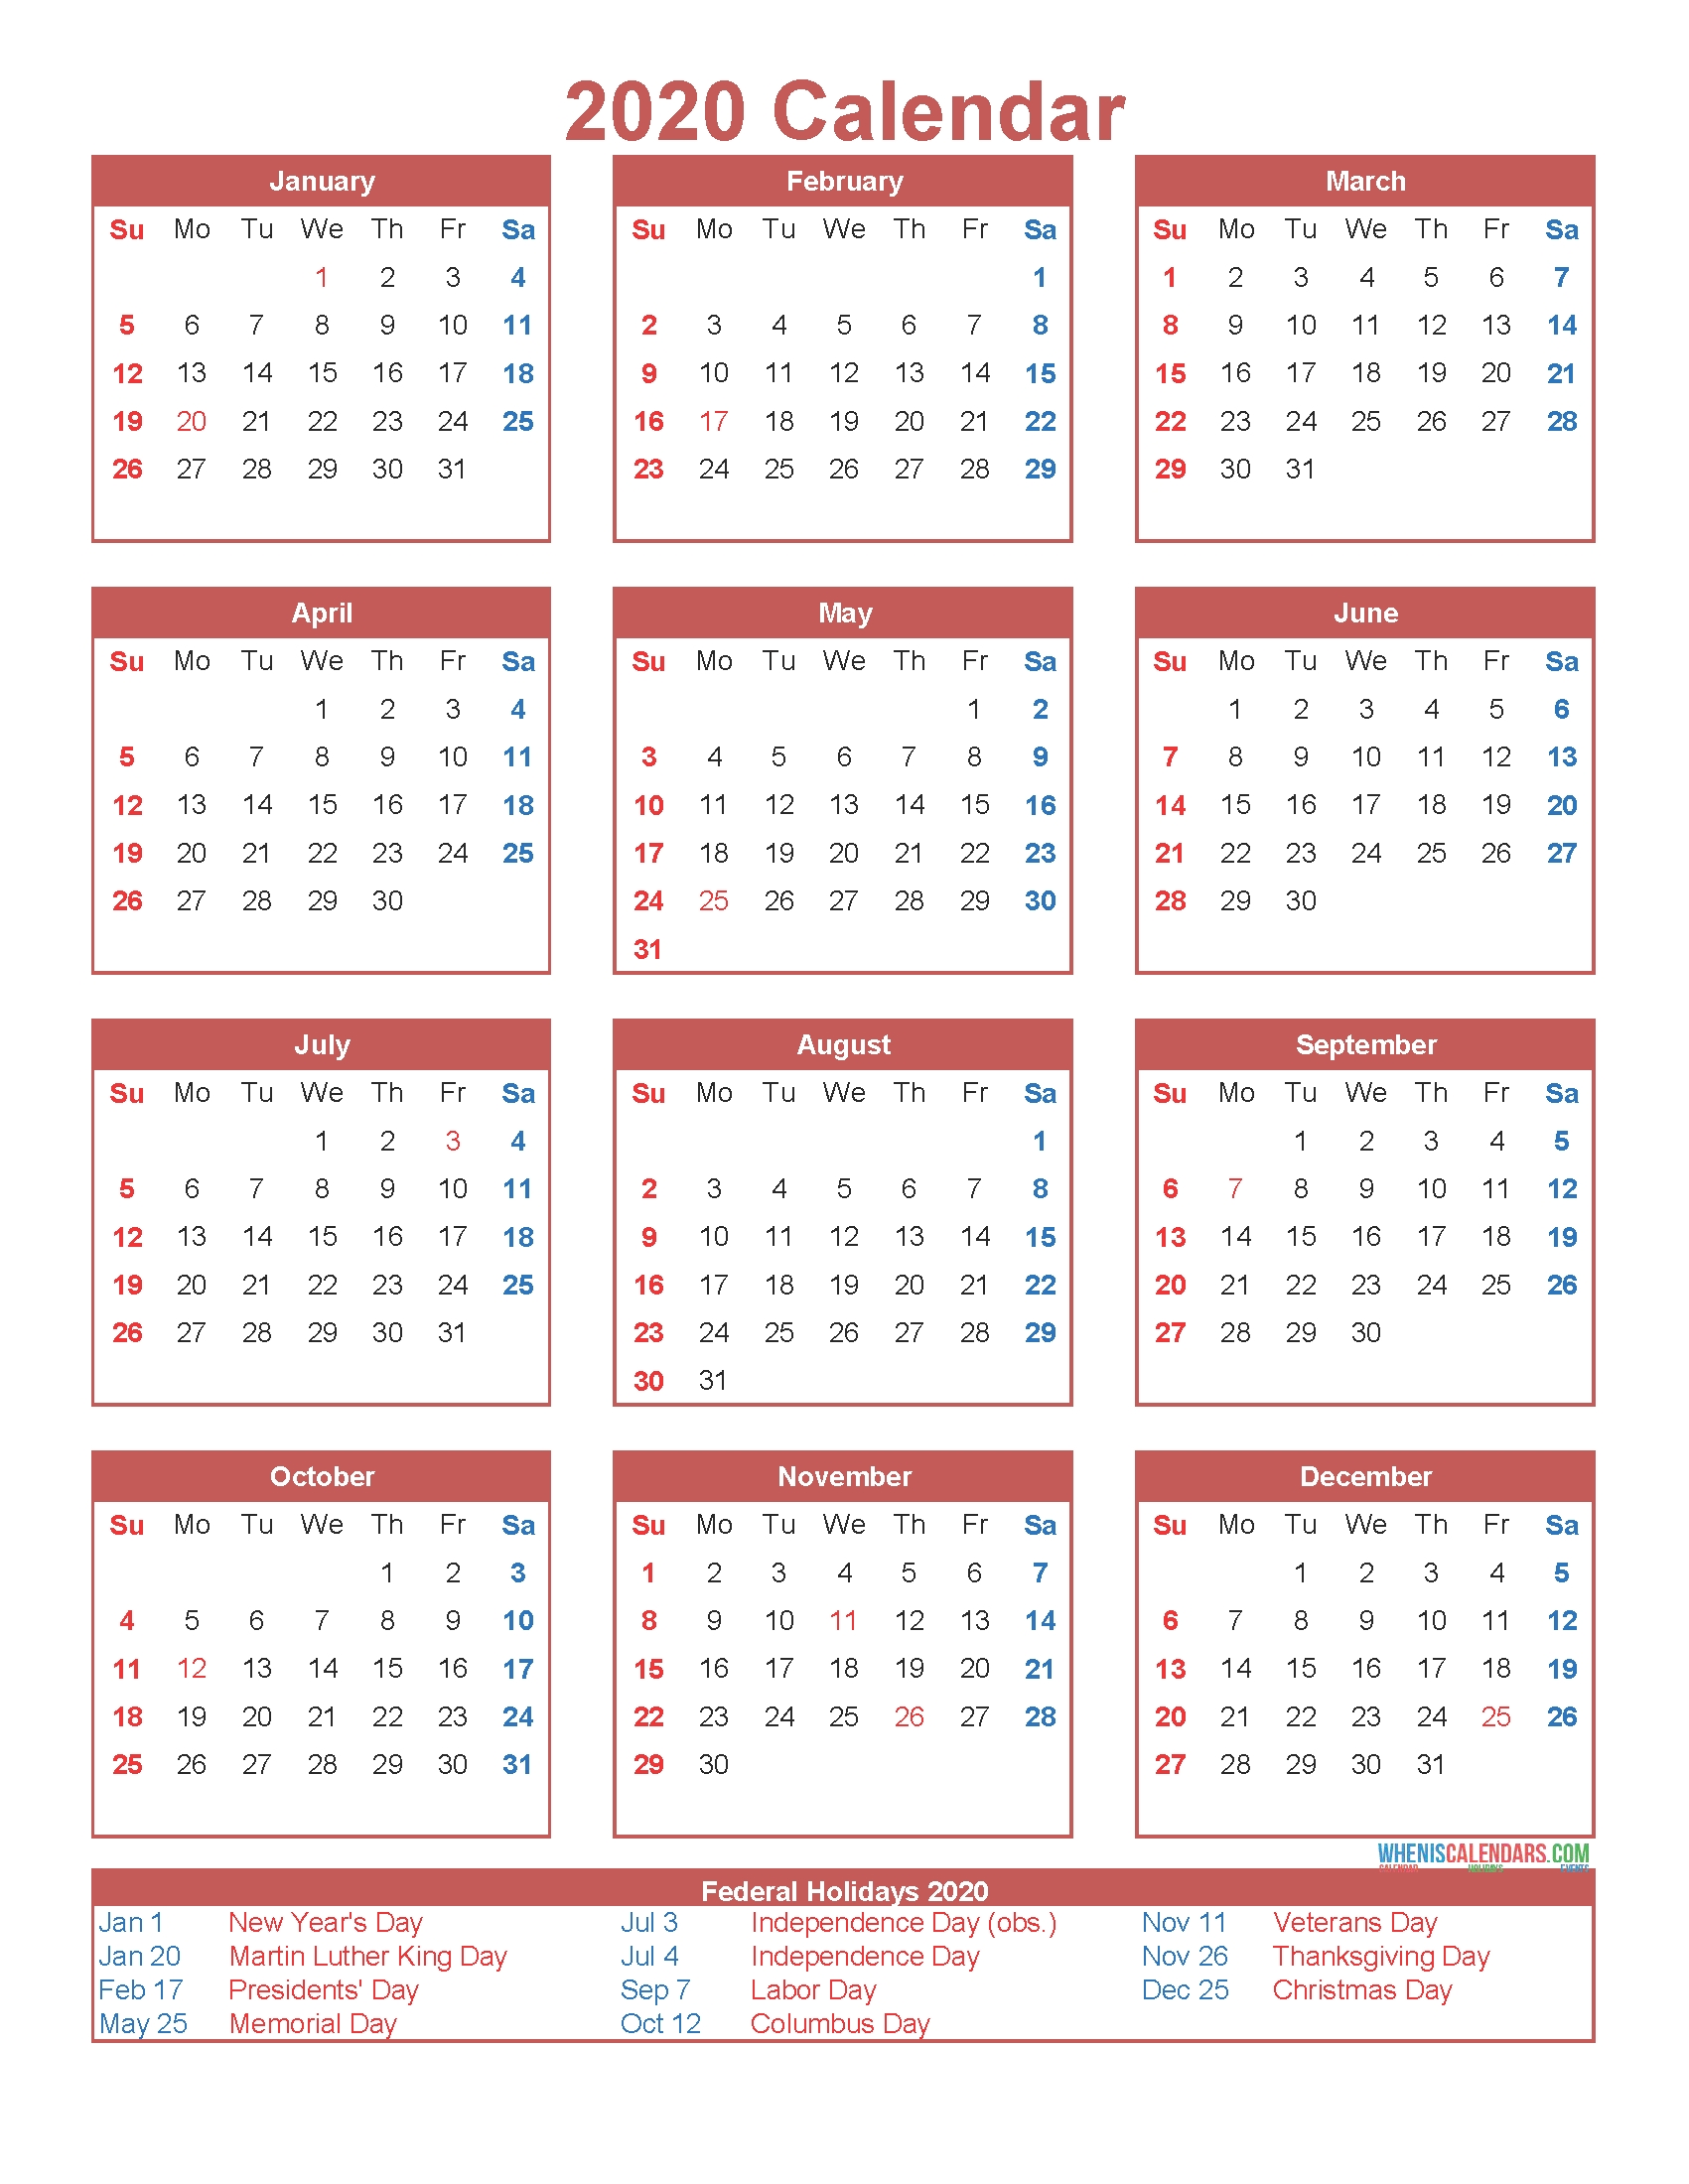 Free Printable 12 Month Calendar On One Page 2020 | Free Impressive Printable Jewish Holiday Calendar 2020